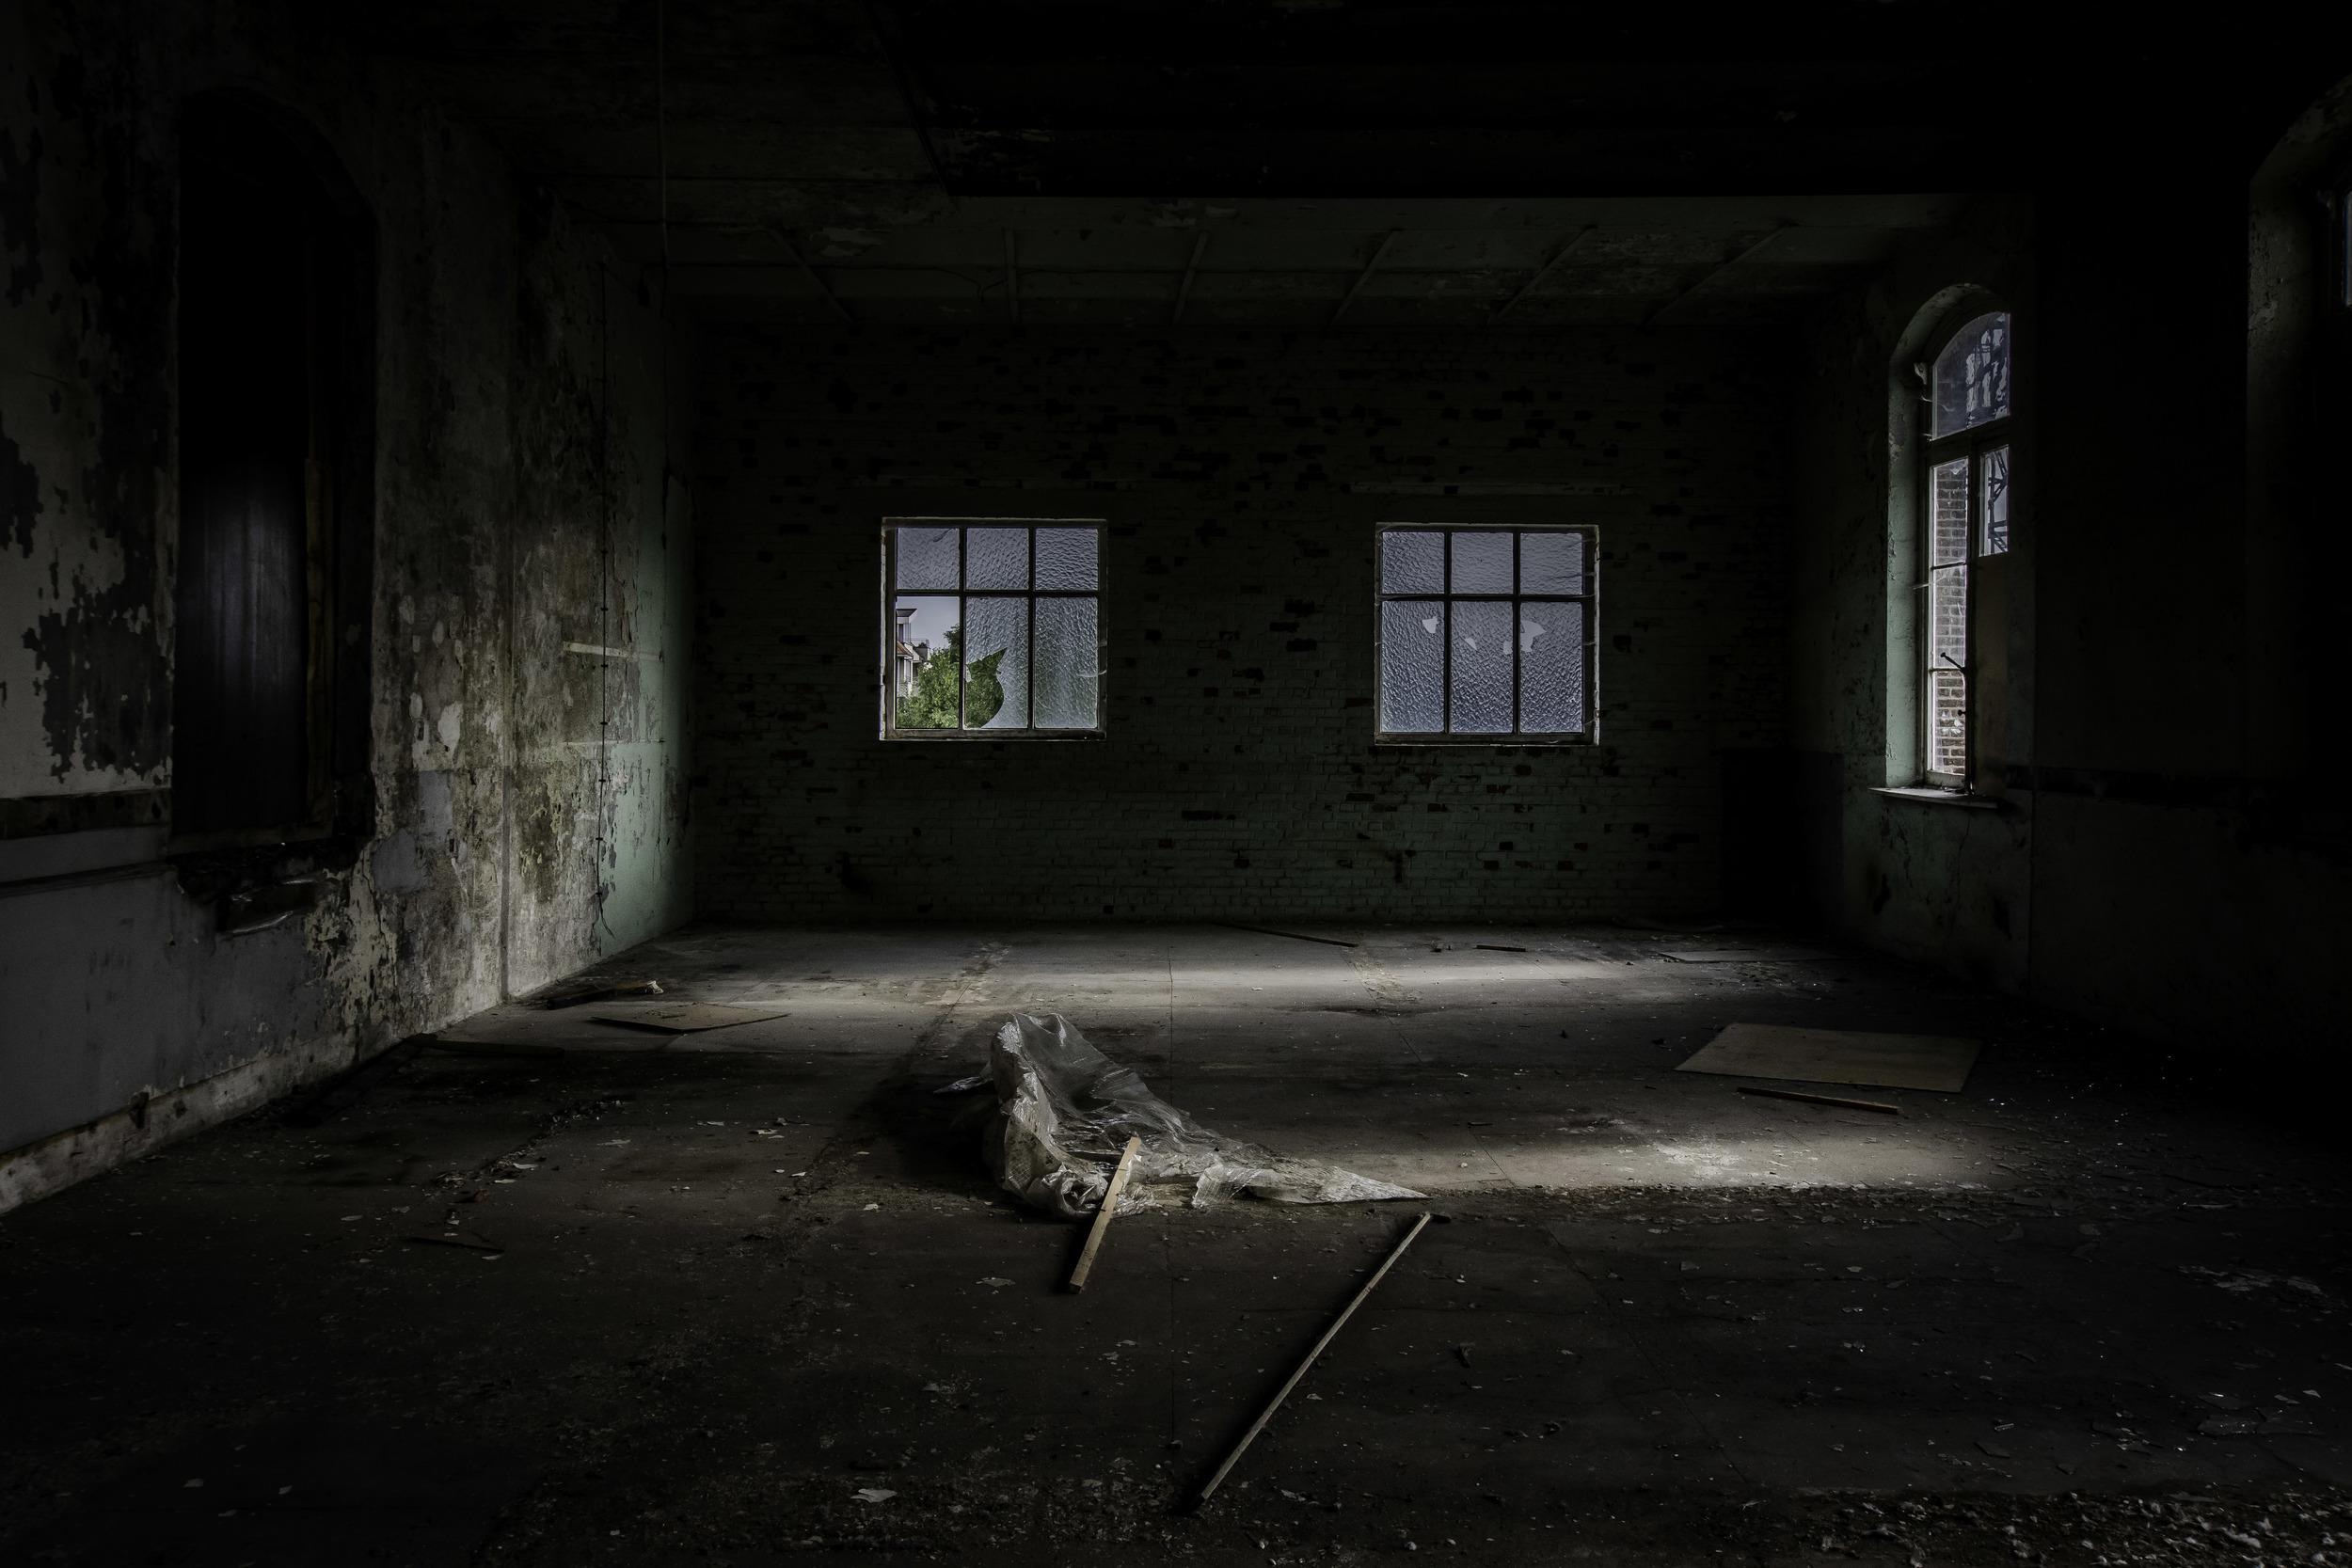 viewfinder-eigenzinnige-fotografie-urbex-vergane-glorie-oude-papierfabriek-seminariezaal-hoek